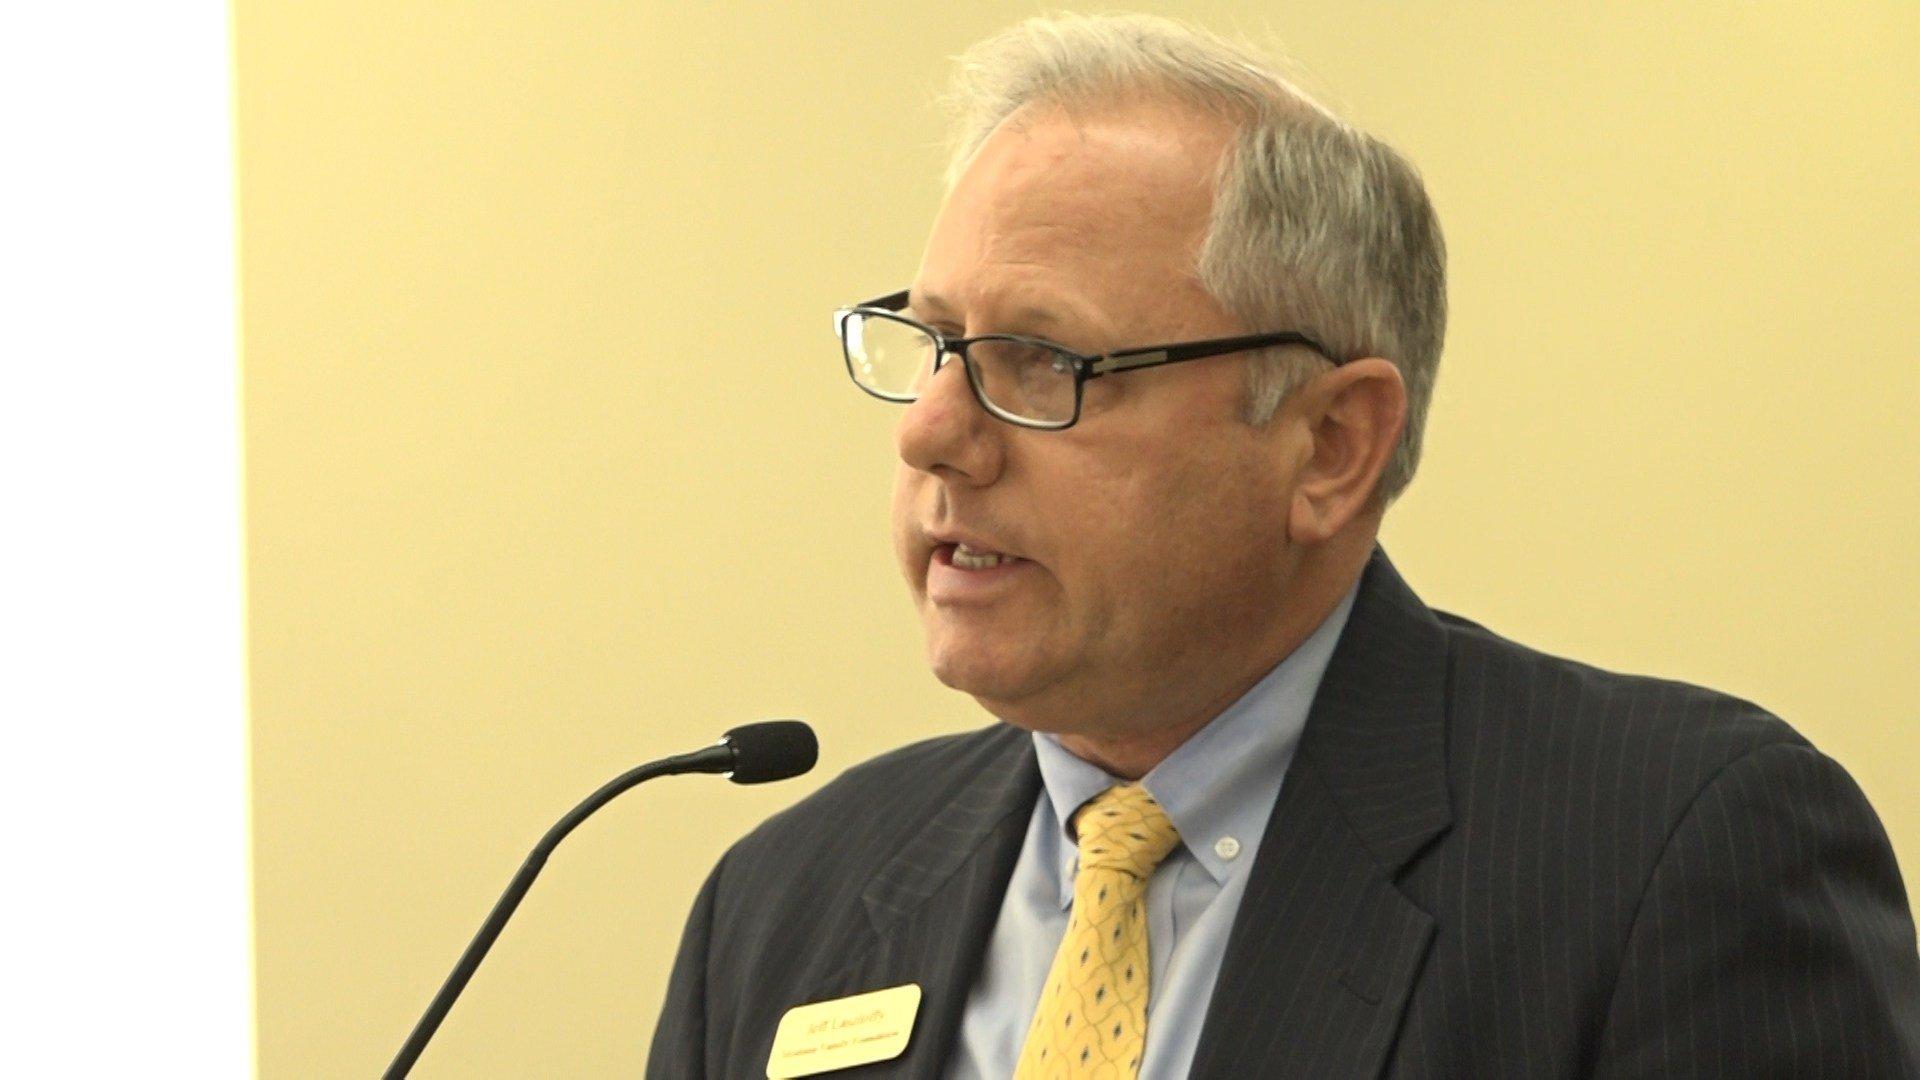 Jeff Laszloffy, president, MT Family Foundation